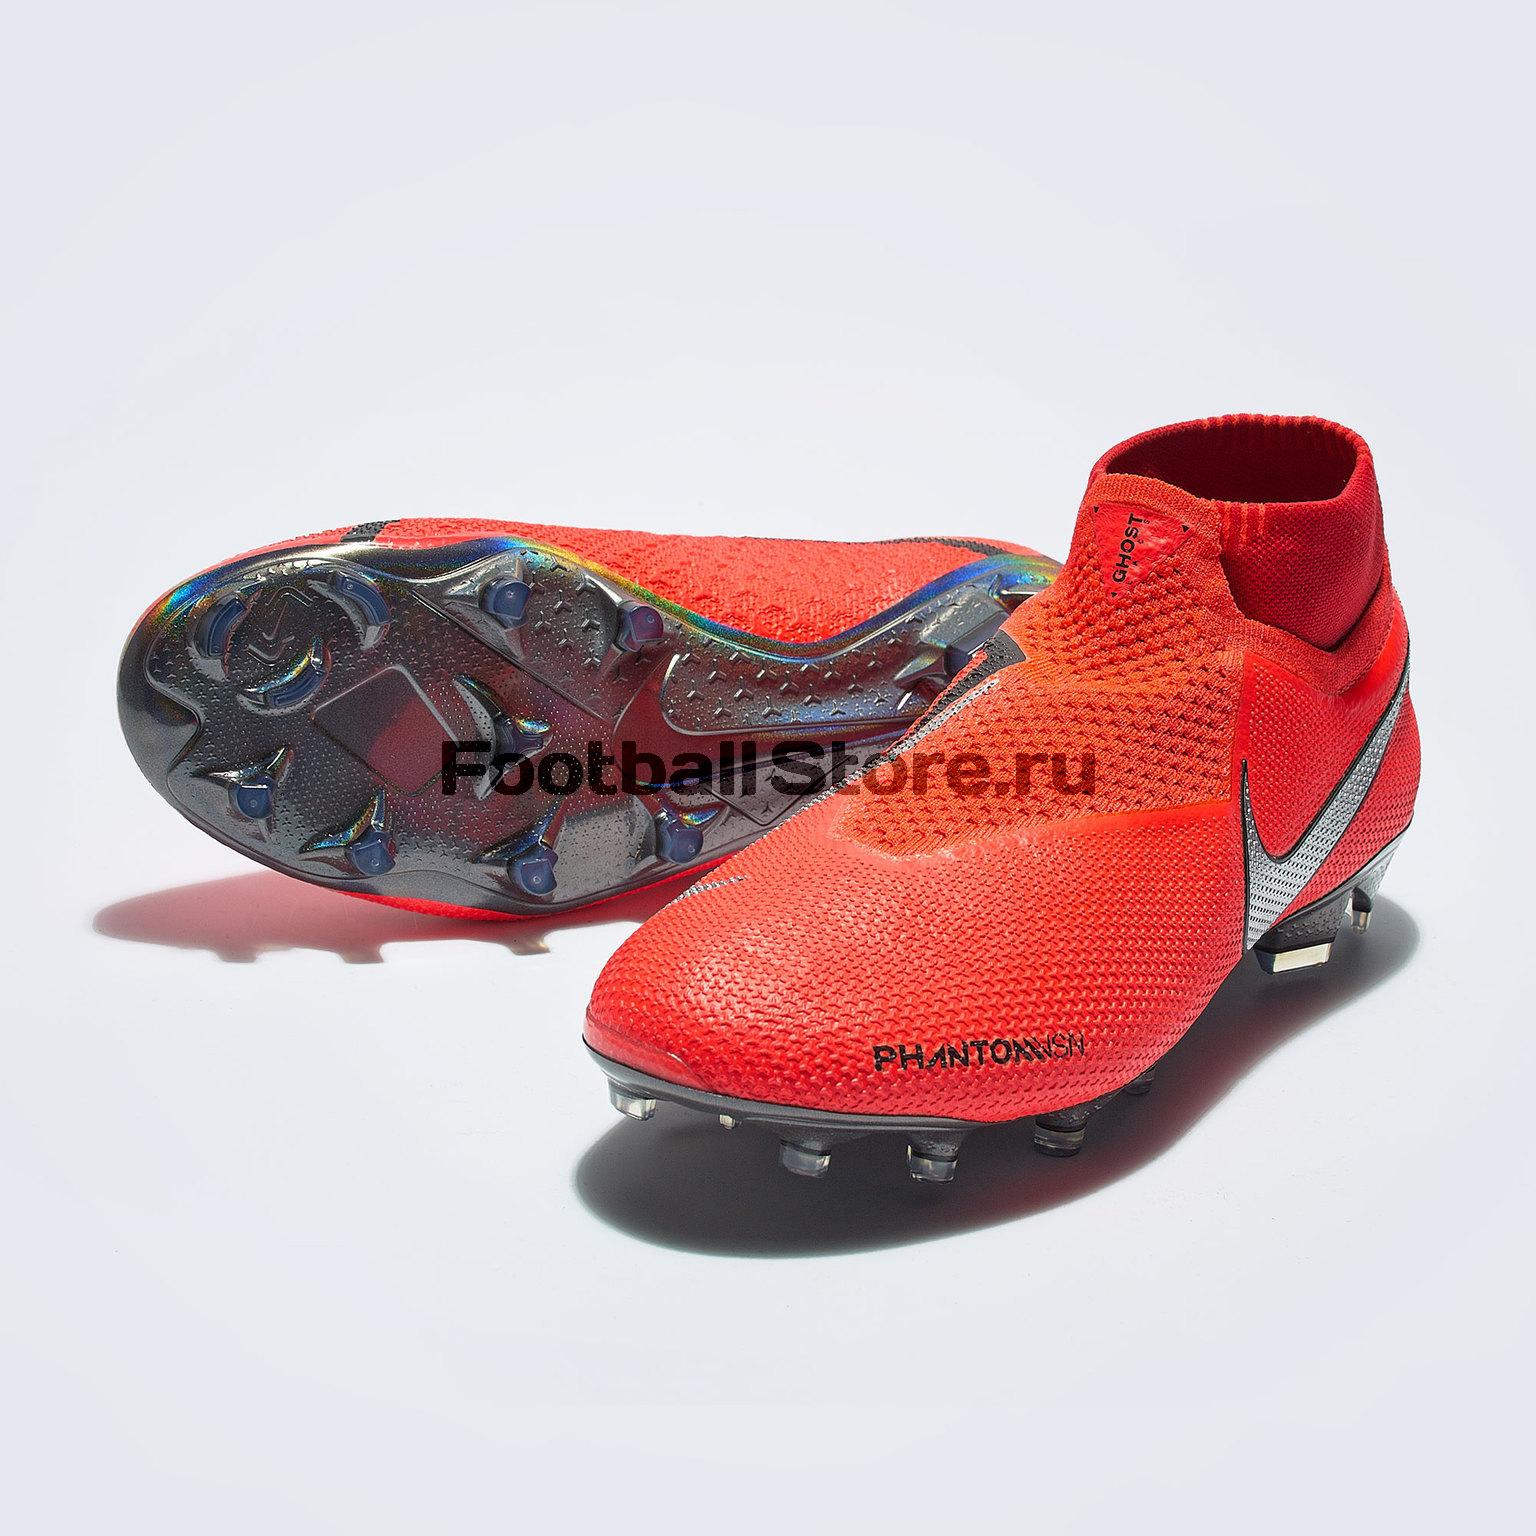 Бутсы Nike Phantom Vision Elite DF FG AO3262-600 бутсы детские nike phantom vision academy df sg aq9298 400